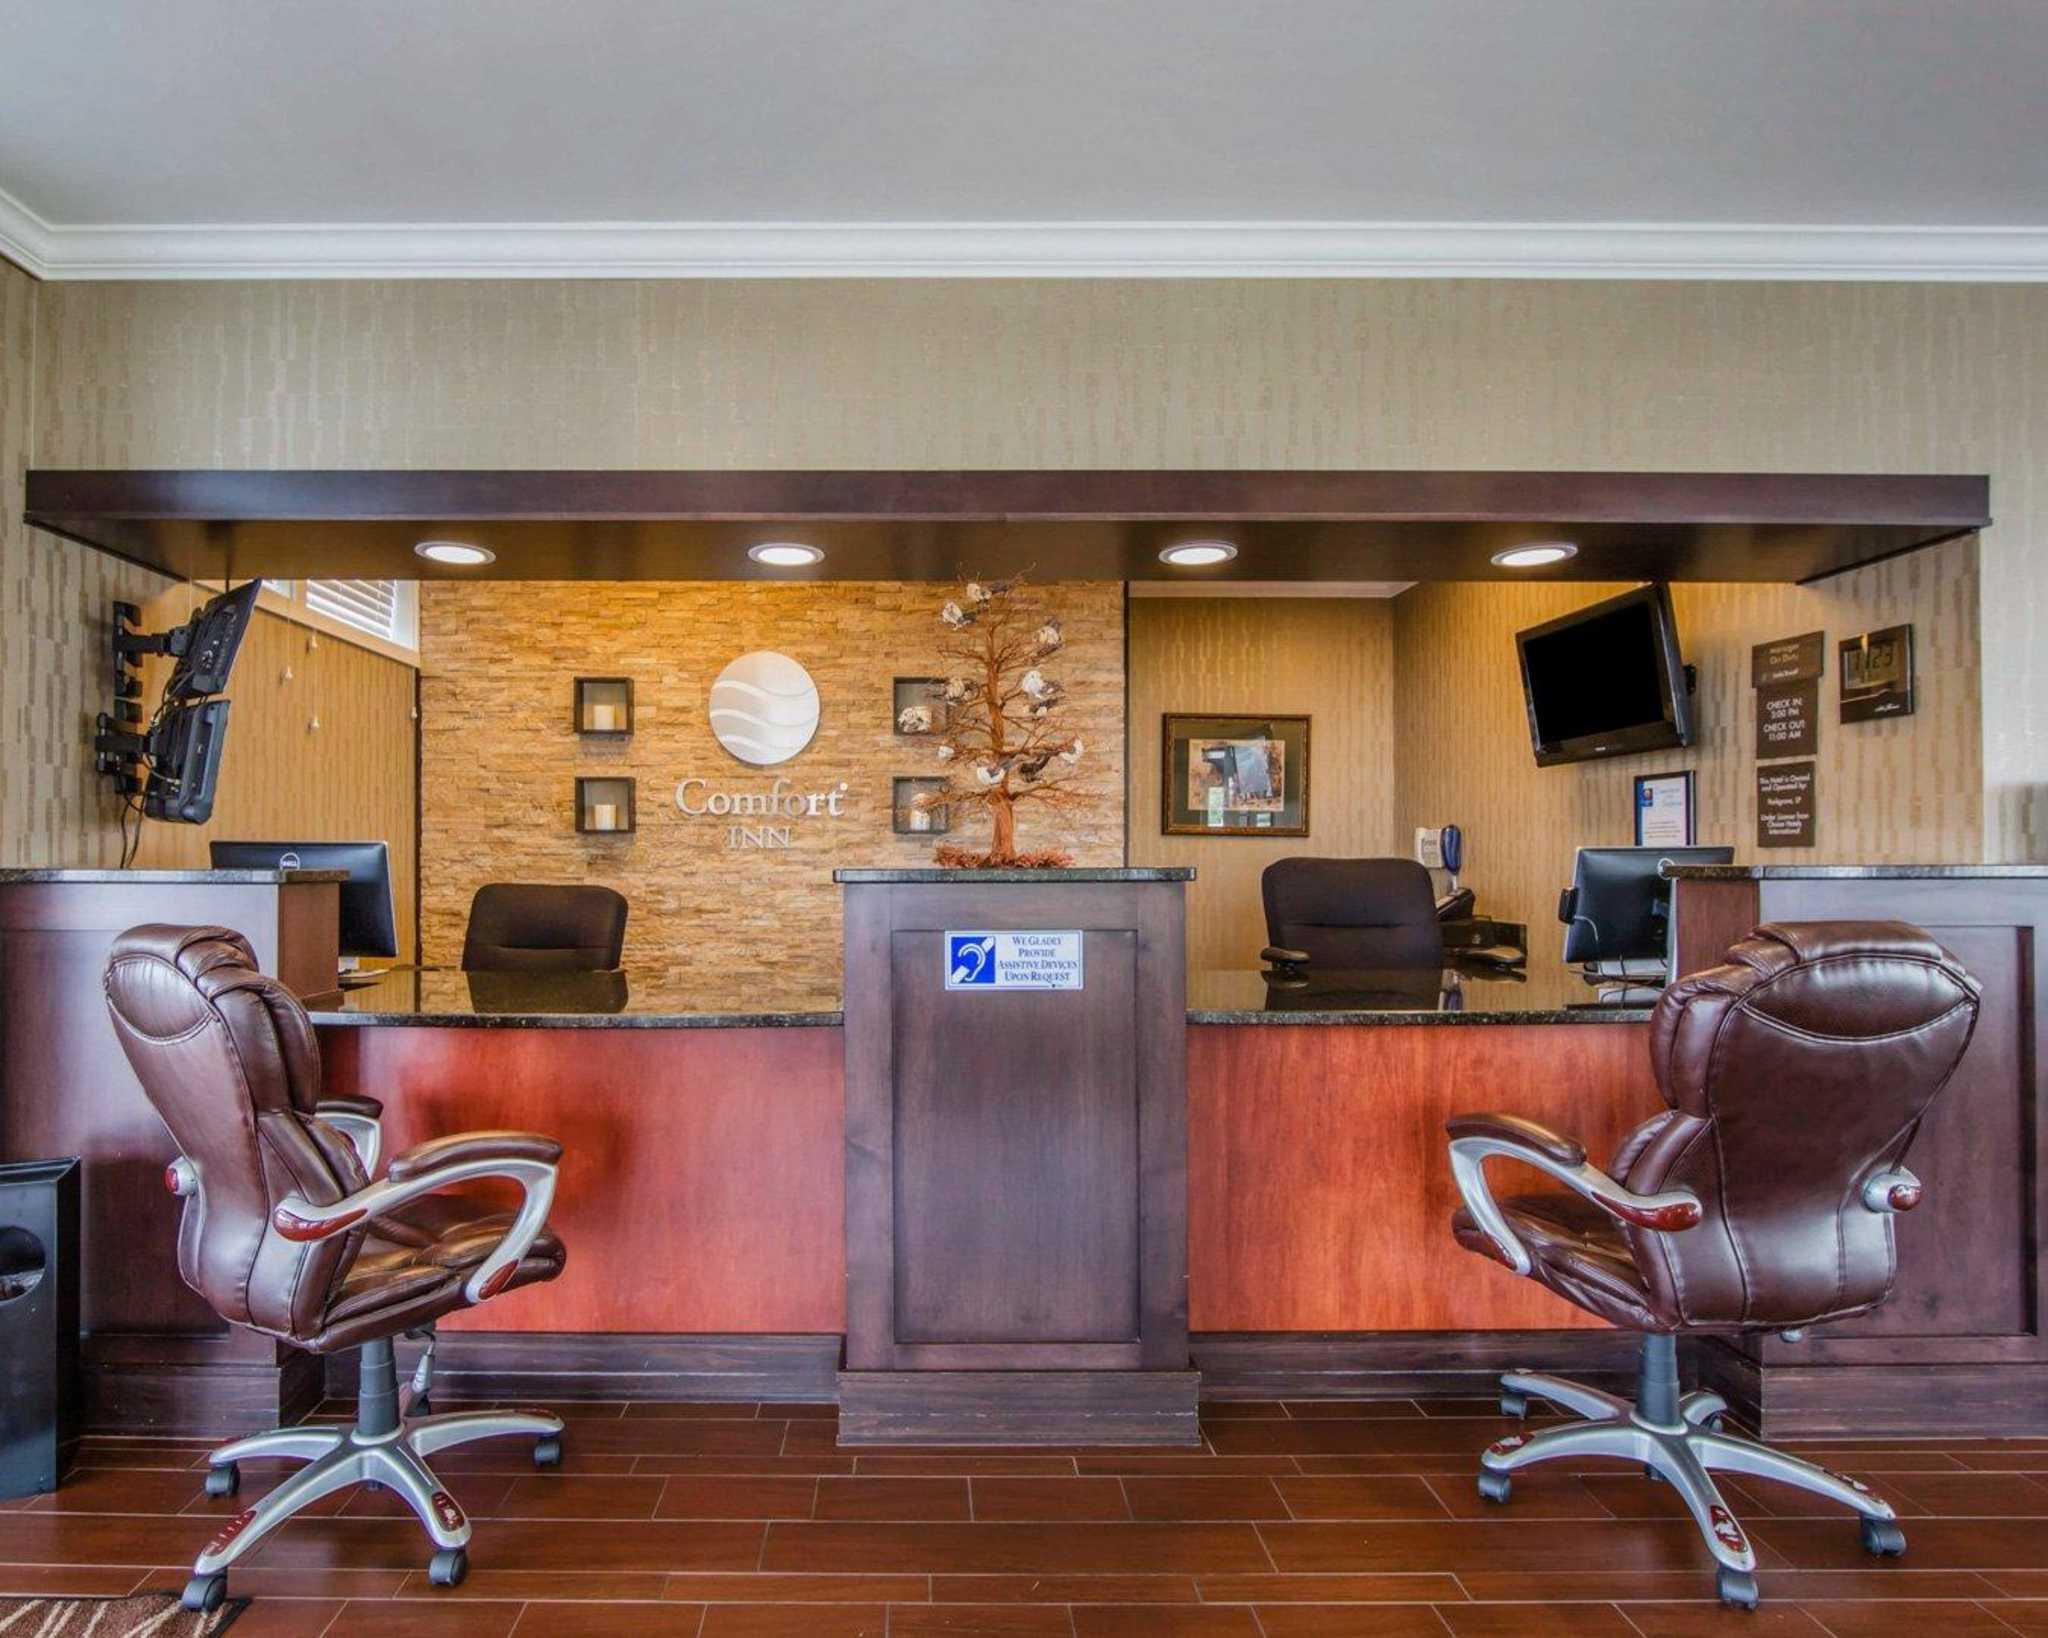 Comfort Inn Apple Valley image 21